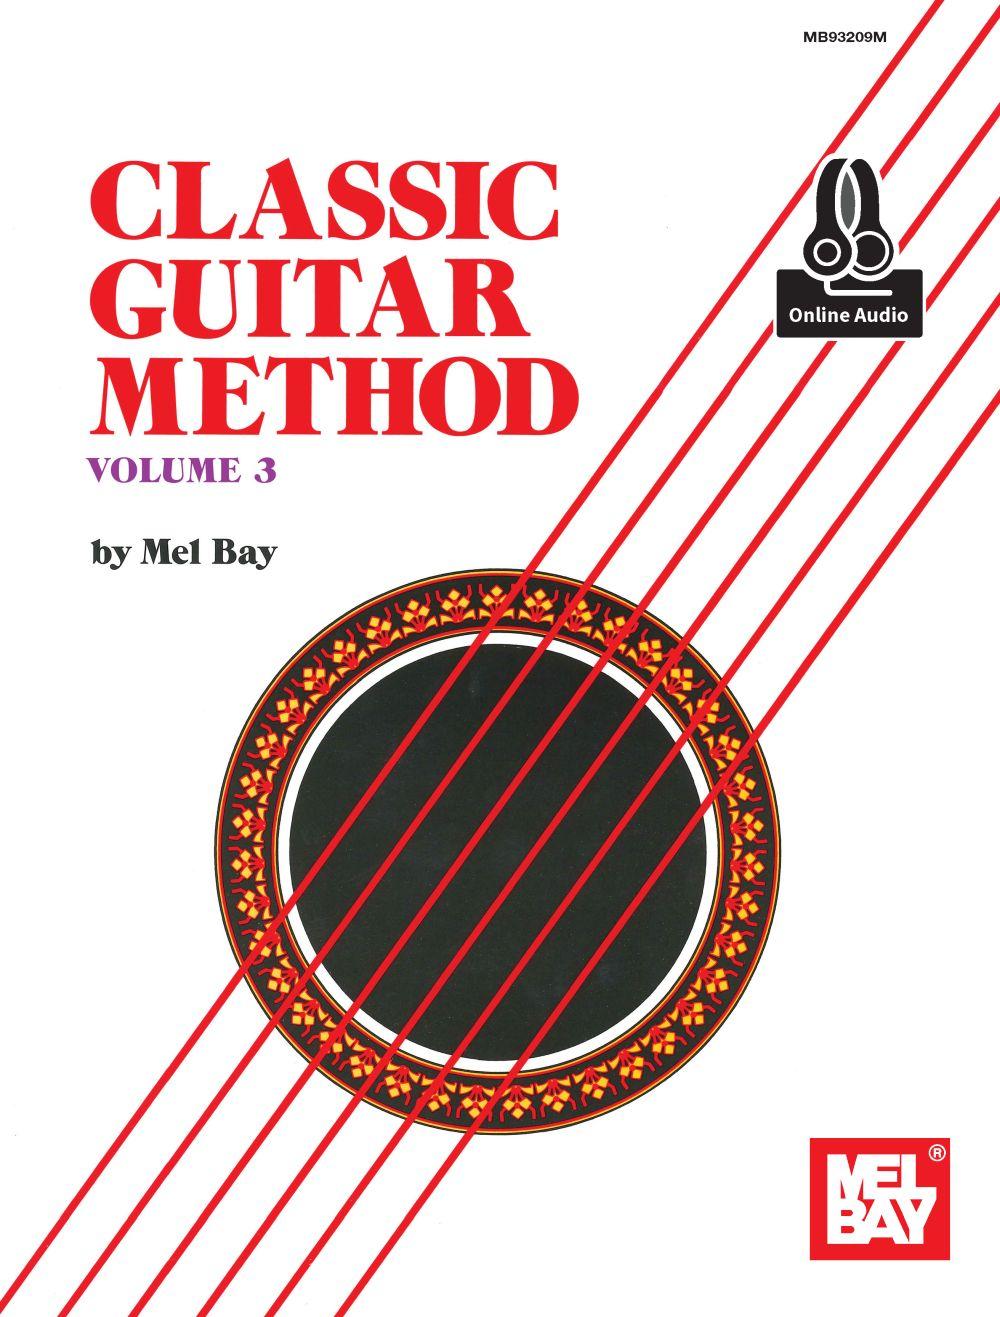 Classic Guitar Method Volume 3 Book: Guitar: Instrumental Tutor